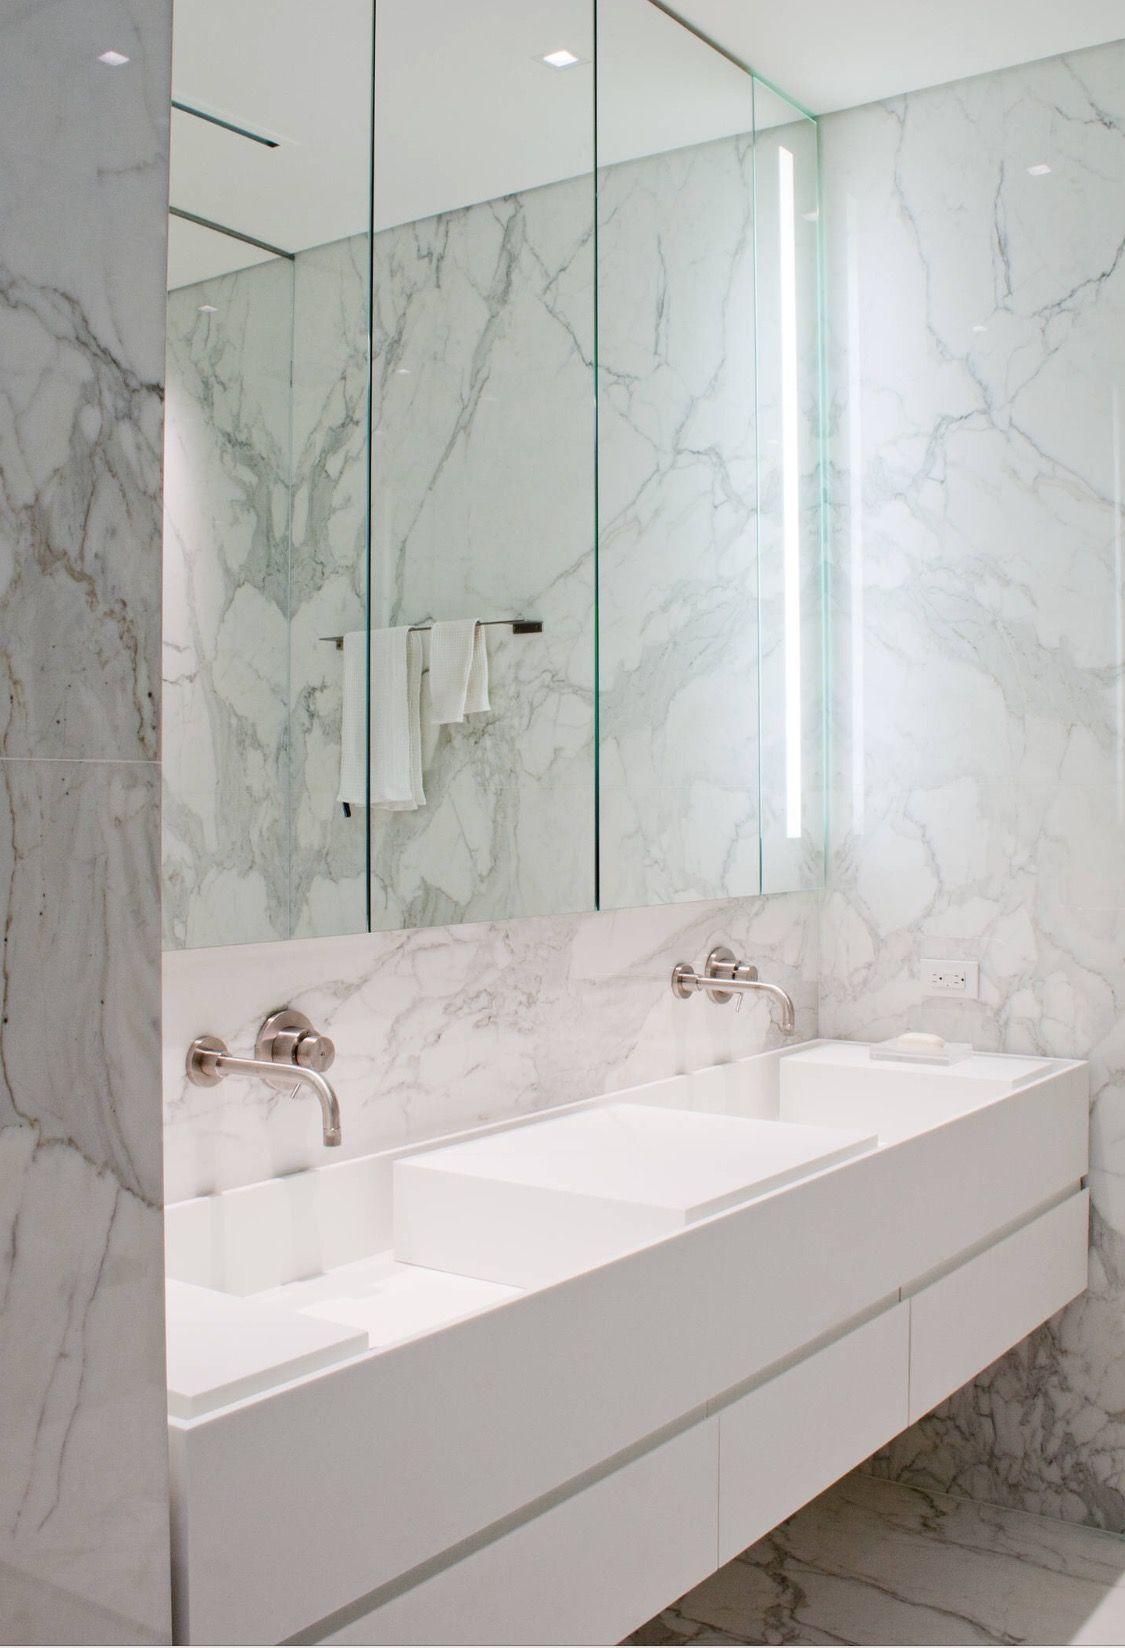 Master bath inset sinks bad - Marmorfliesen bad ...